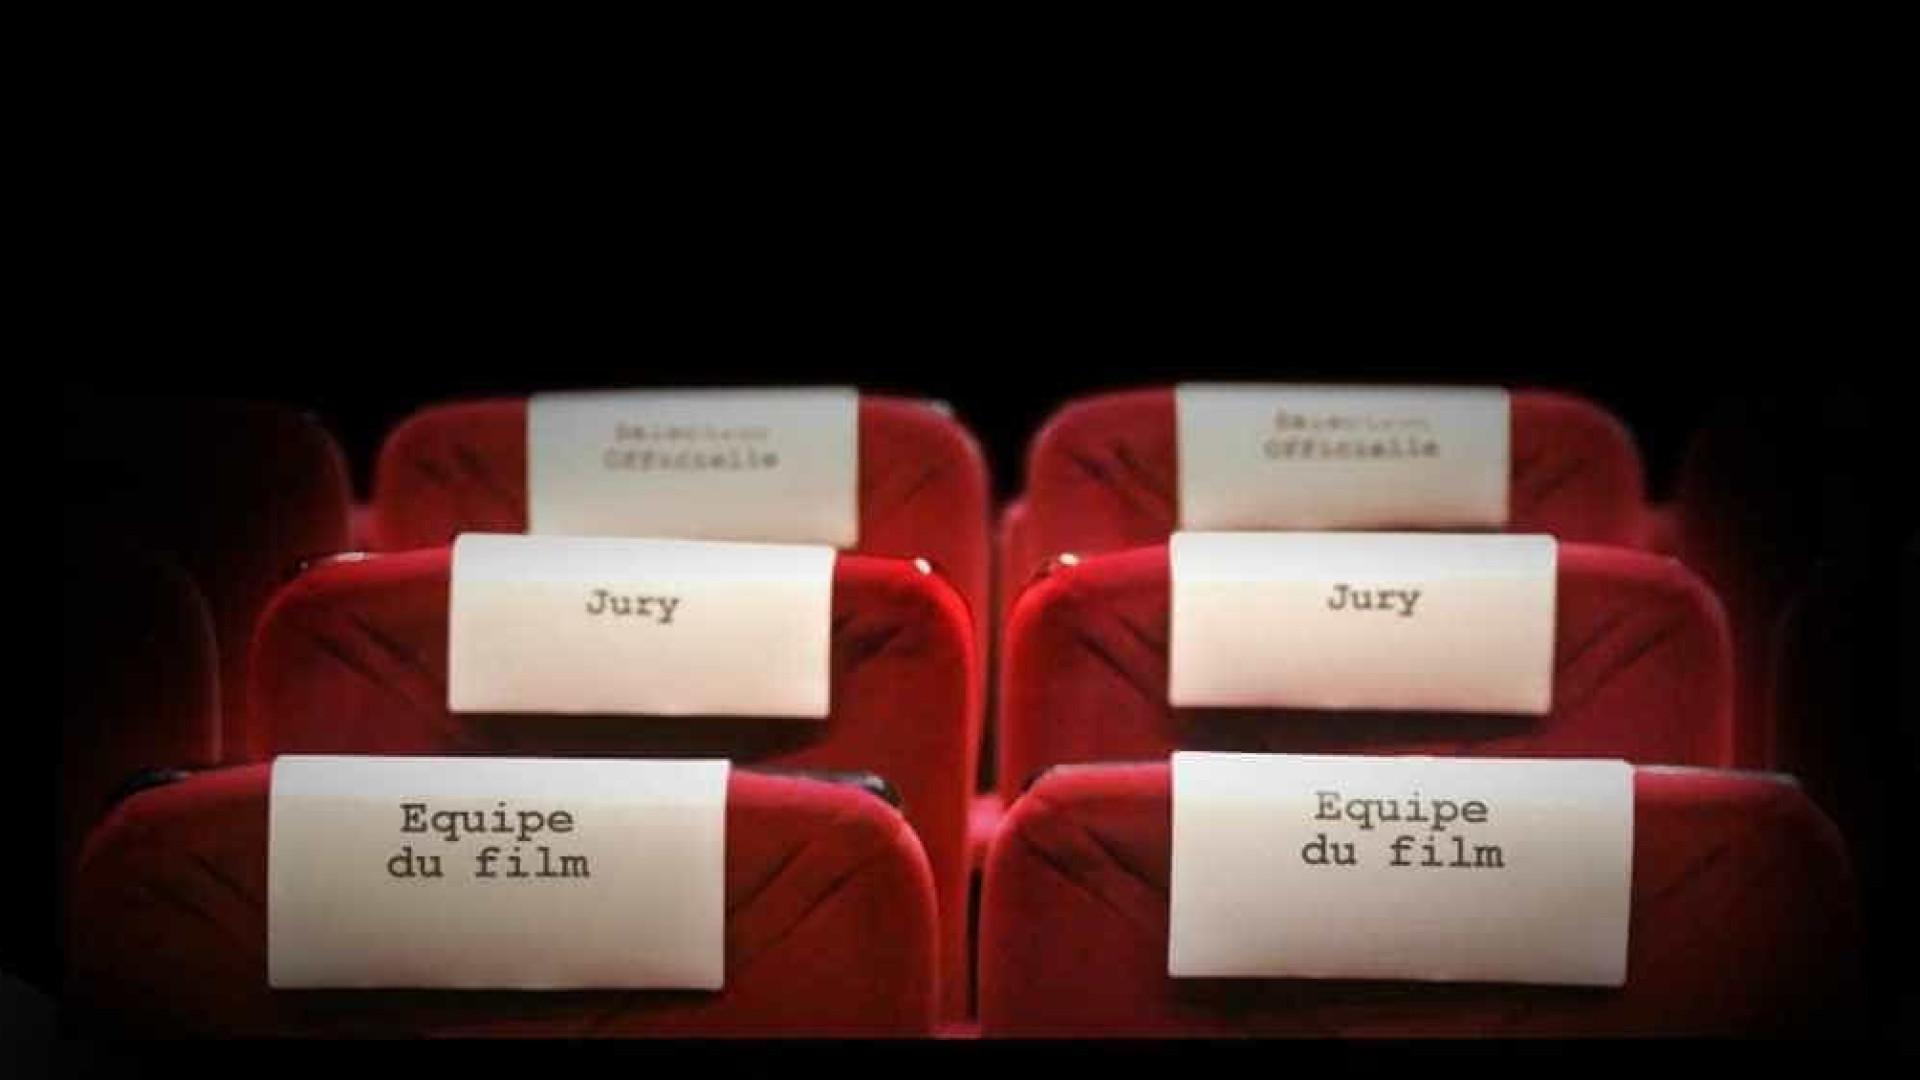 Dois filmes portugueses participam na Quinzena de Realizadores, em Cannes